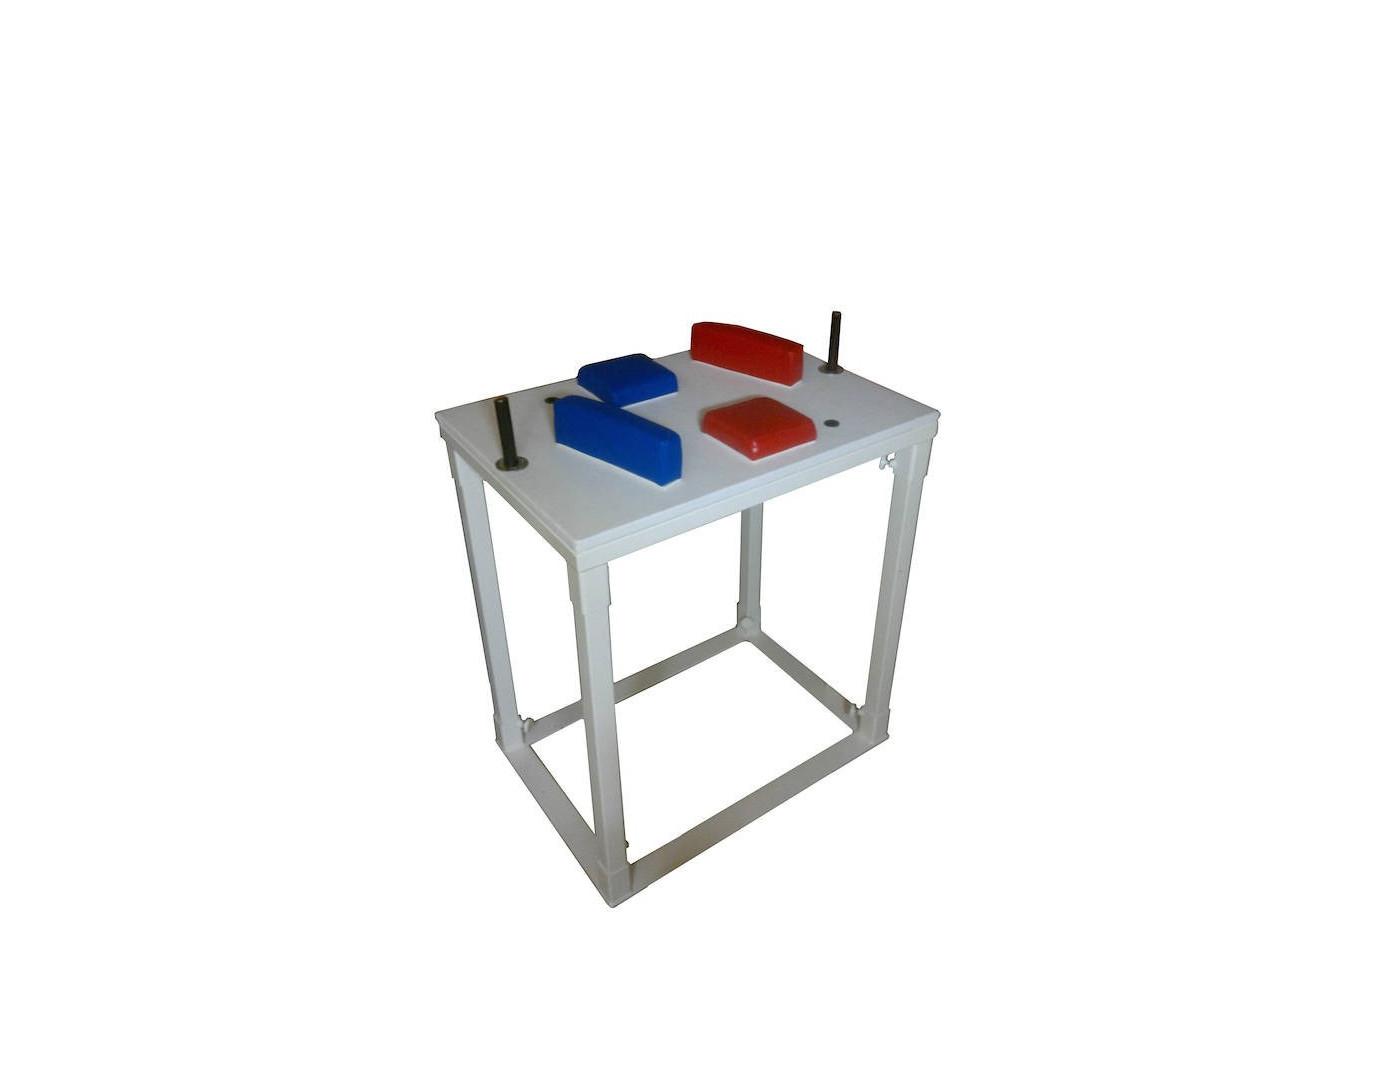 Arm wrestling table (I1)